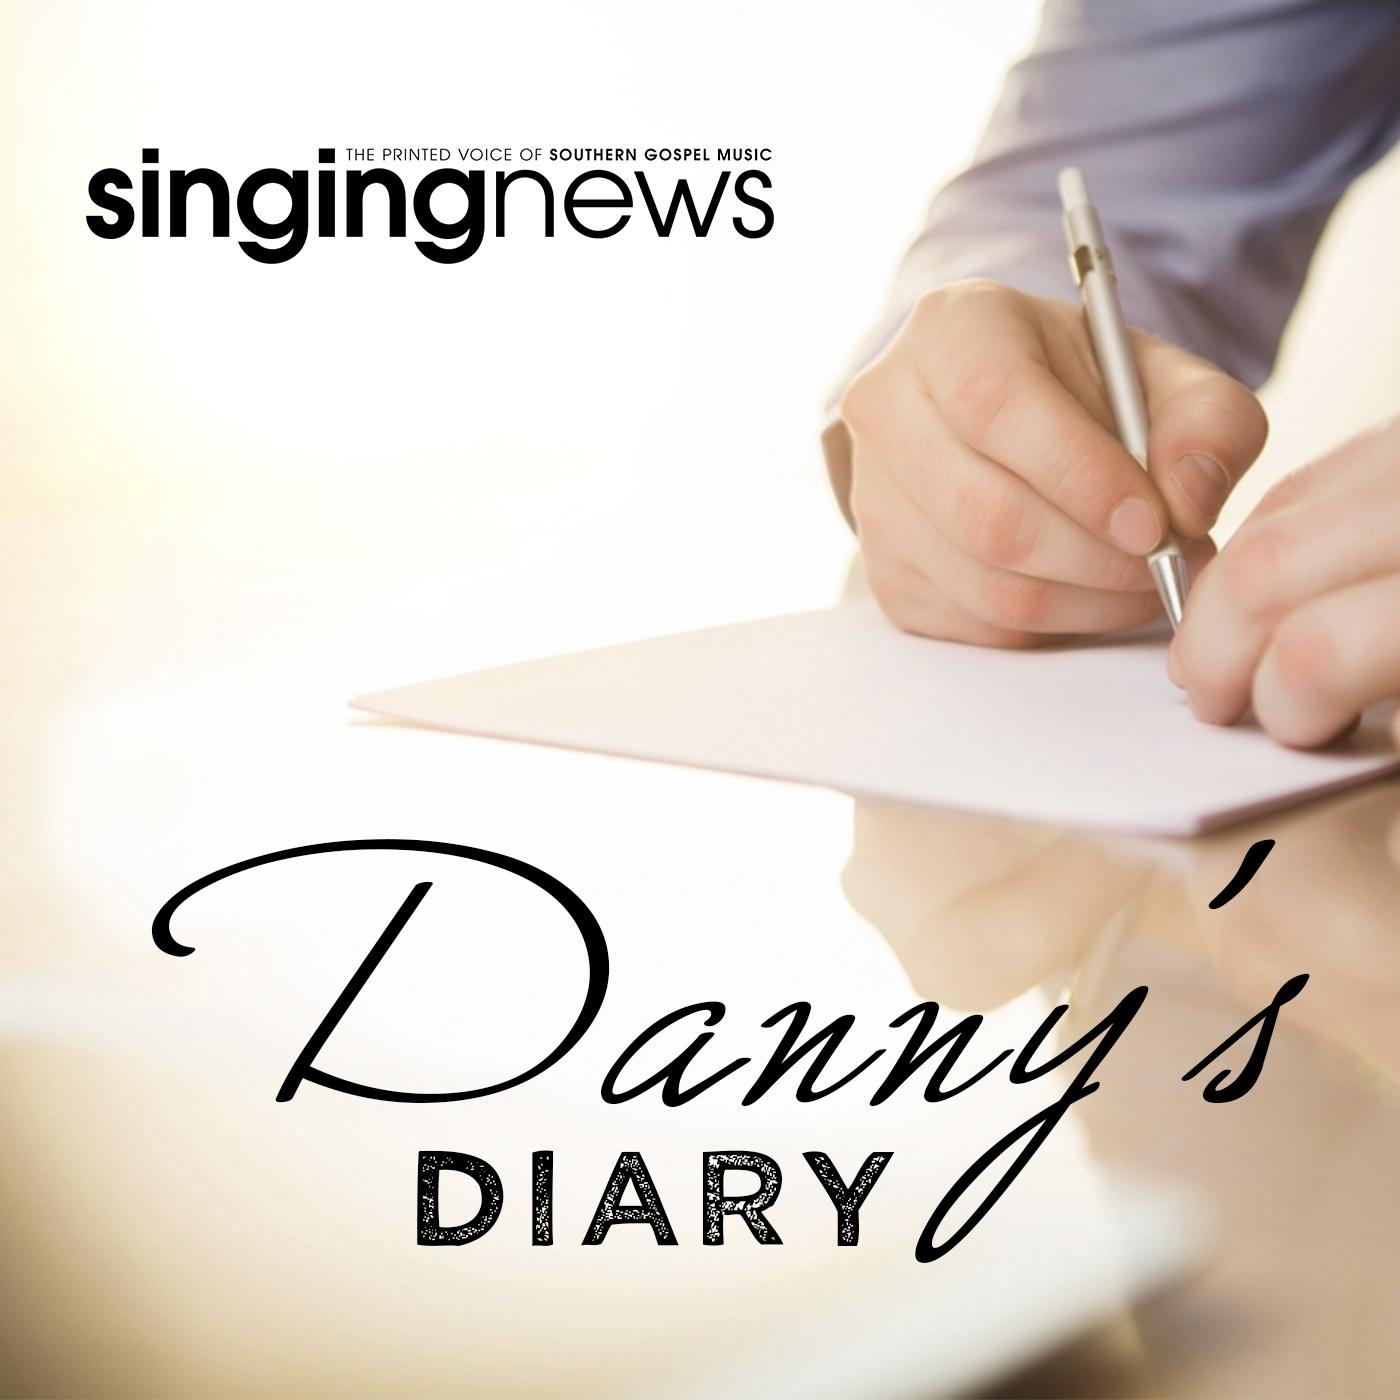 Danny's Diary